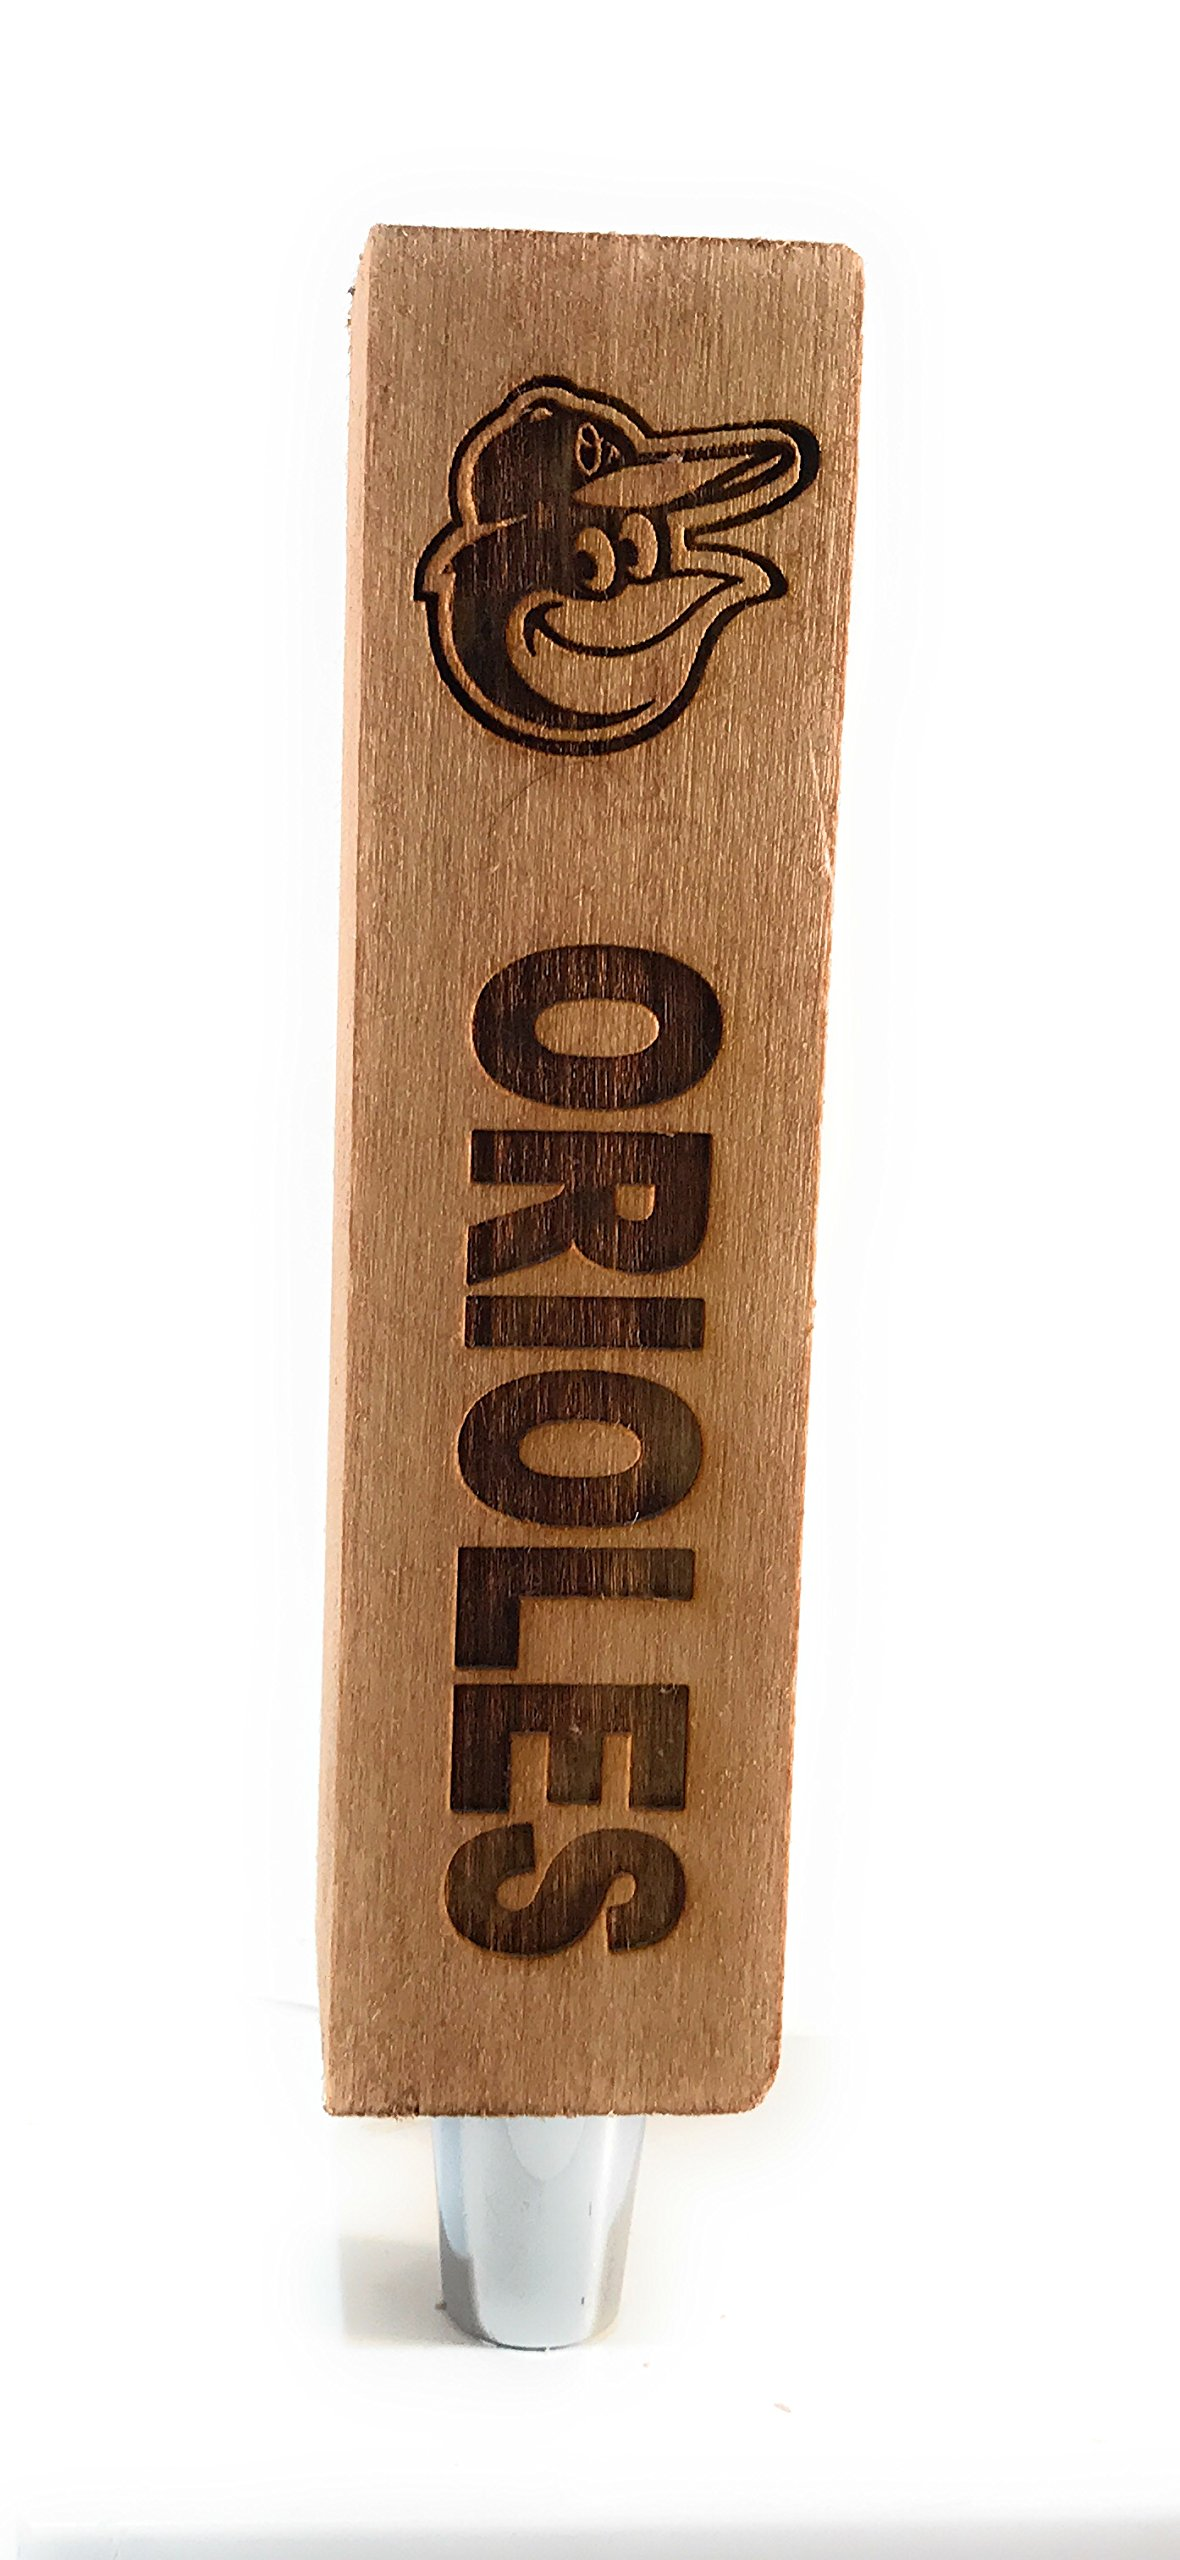 Baltimore Orioles Engraved Beer Tap Handles